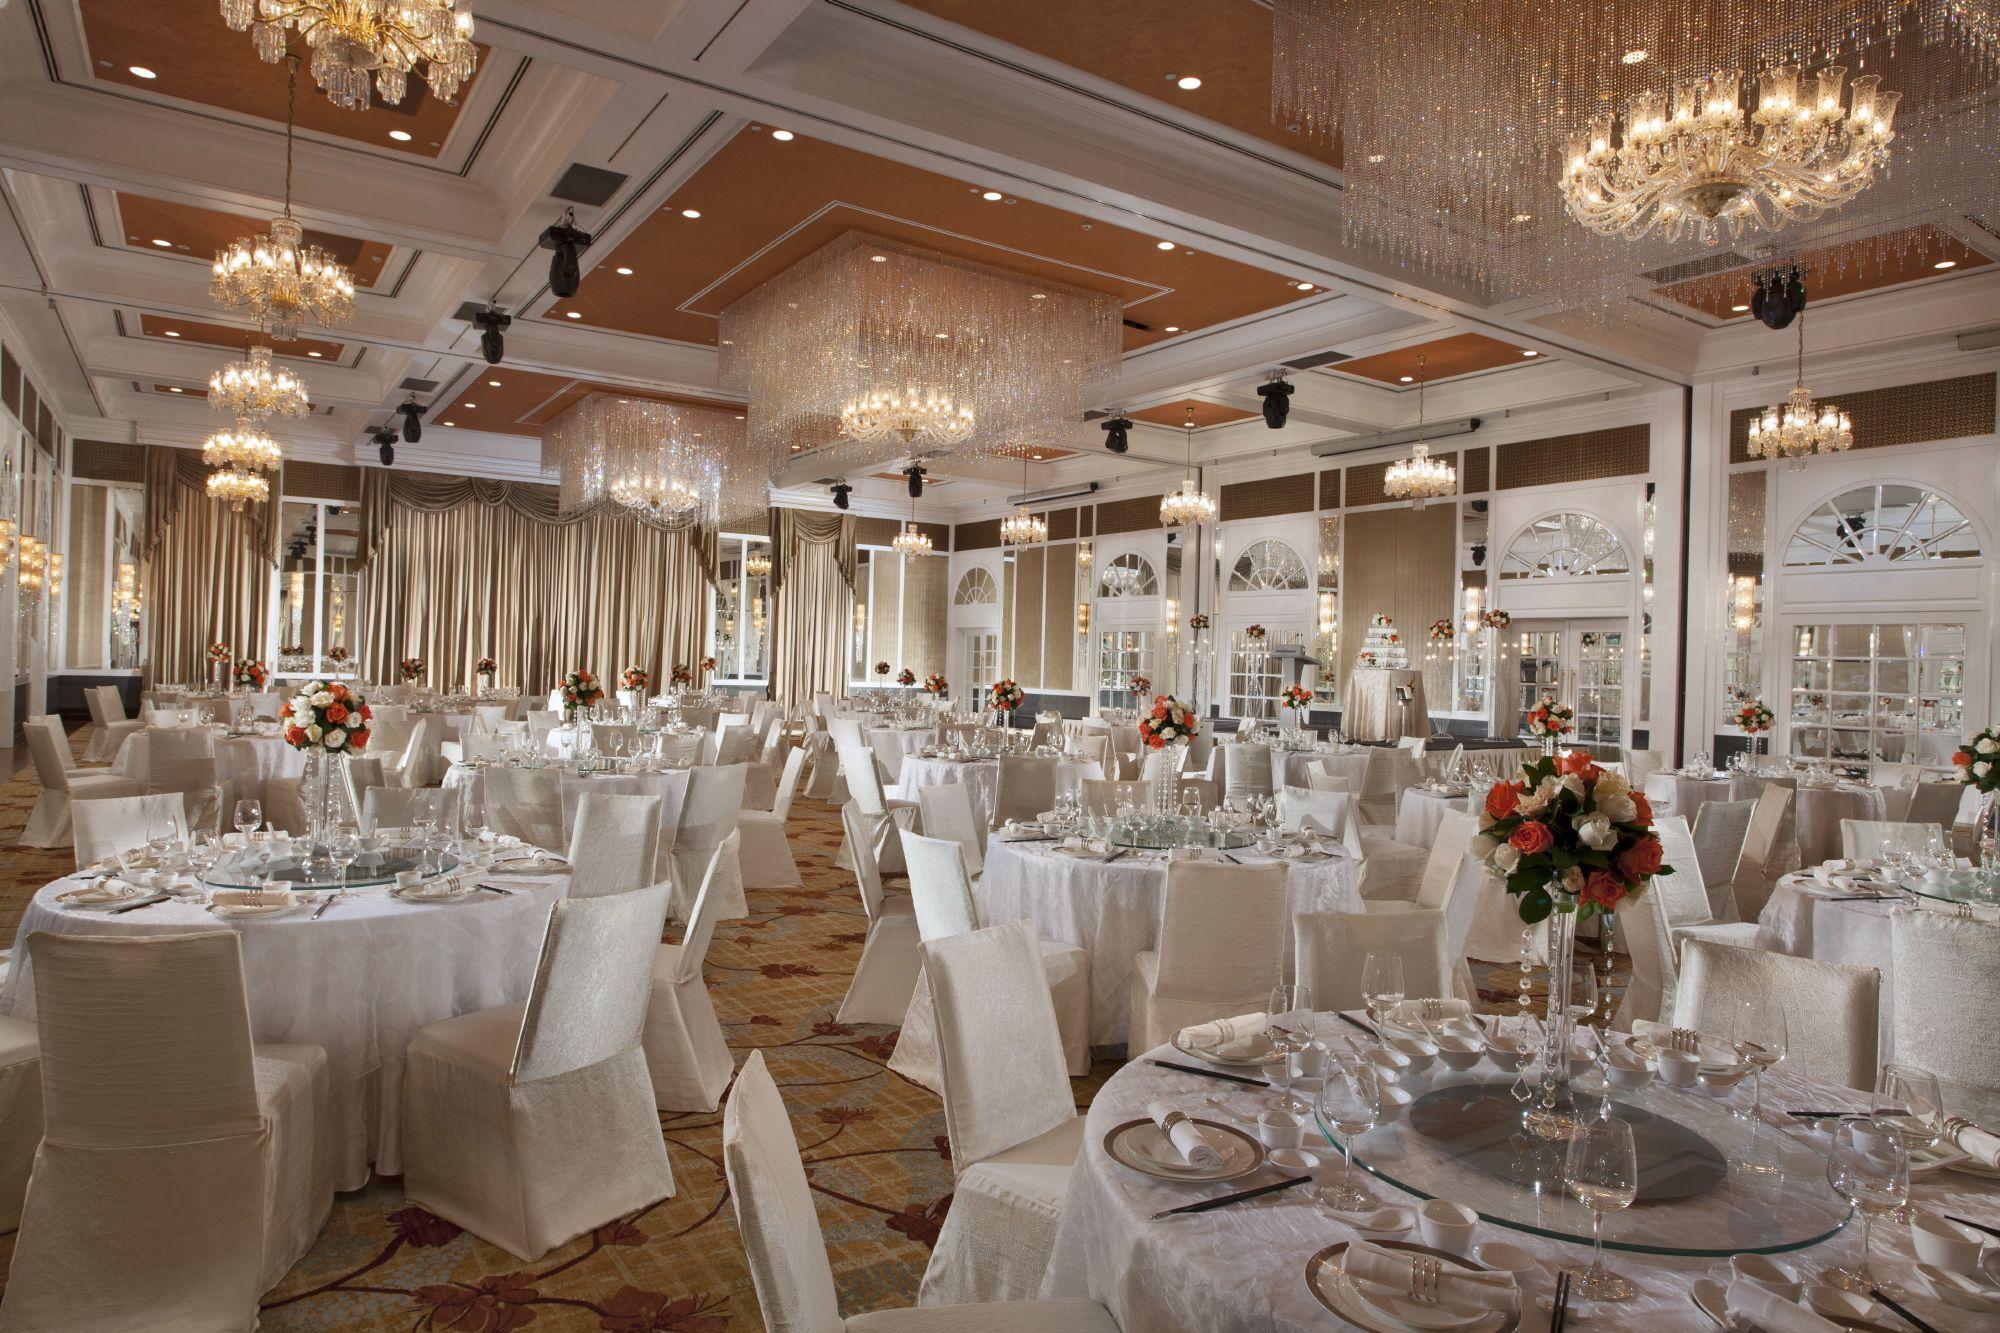 Pillarless Grand Ballroom at InterContinental Singapore